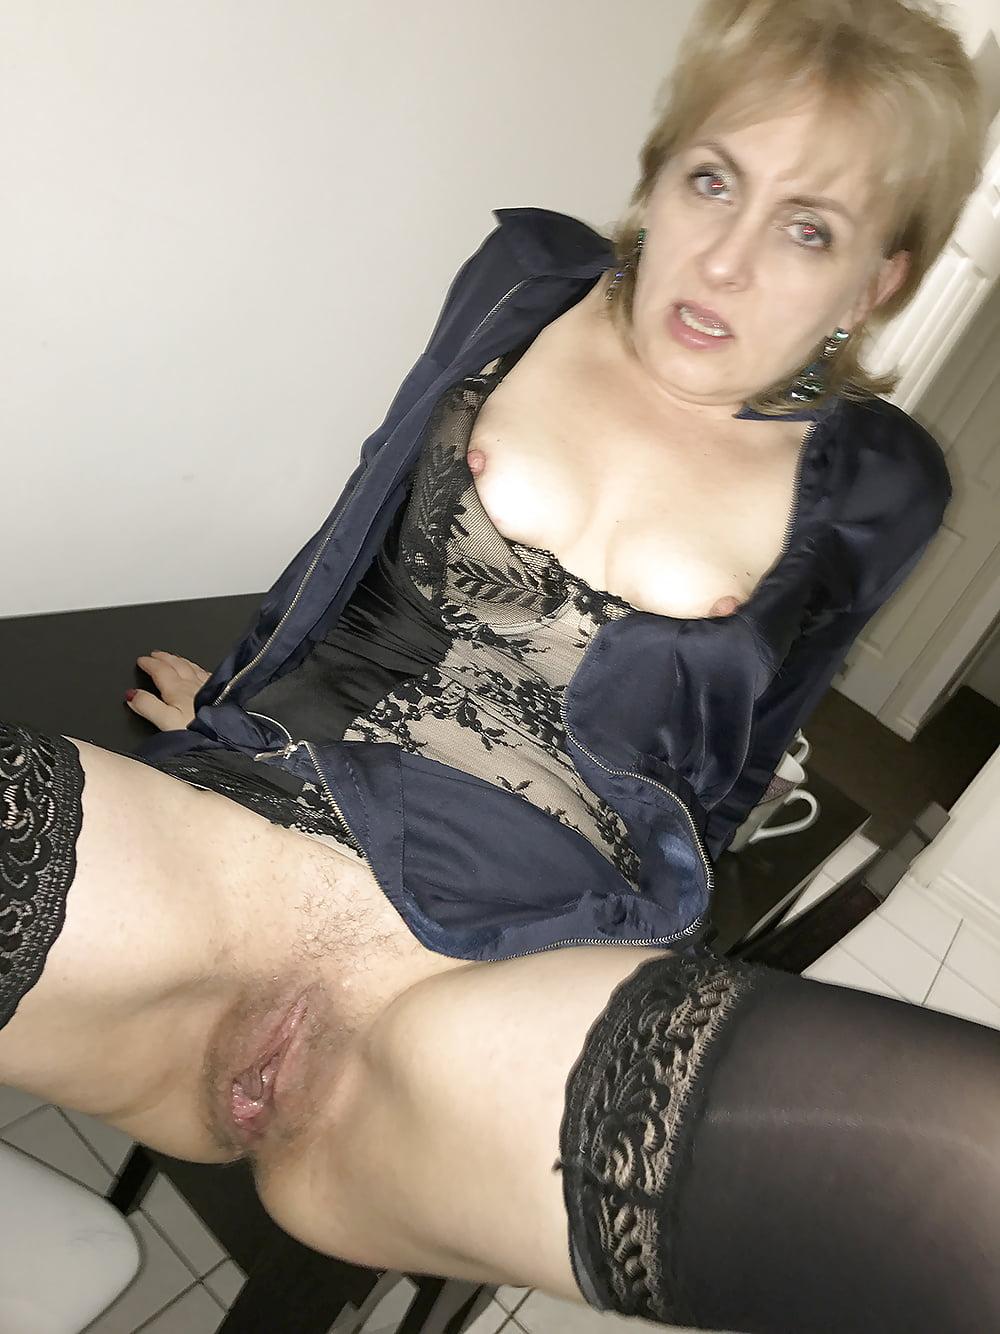 Polish big boobs porn polish big boobs porn